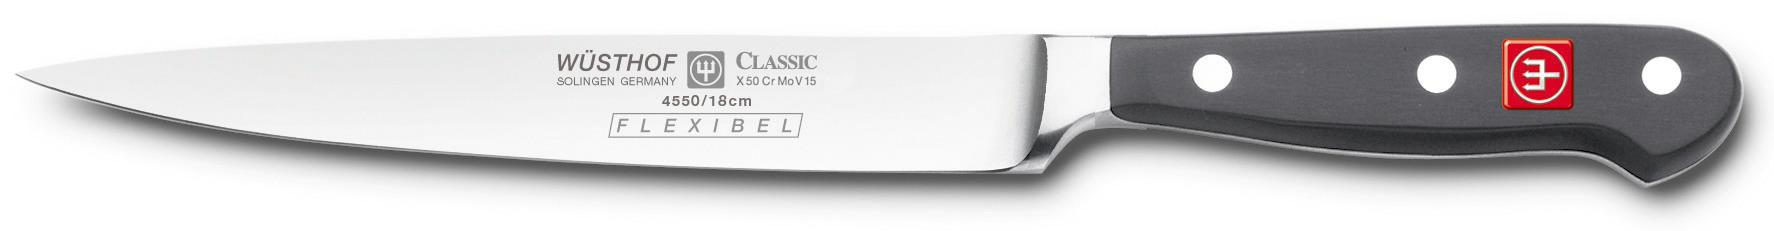 Filiermesser Klingenlänge 180 mm / 305 mm lang